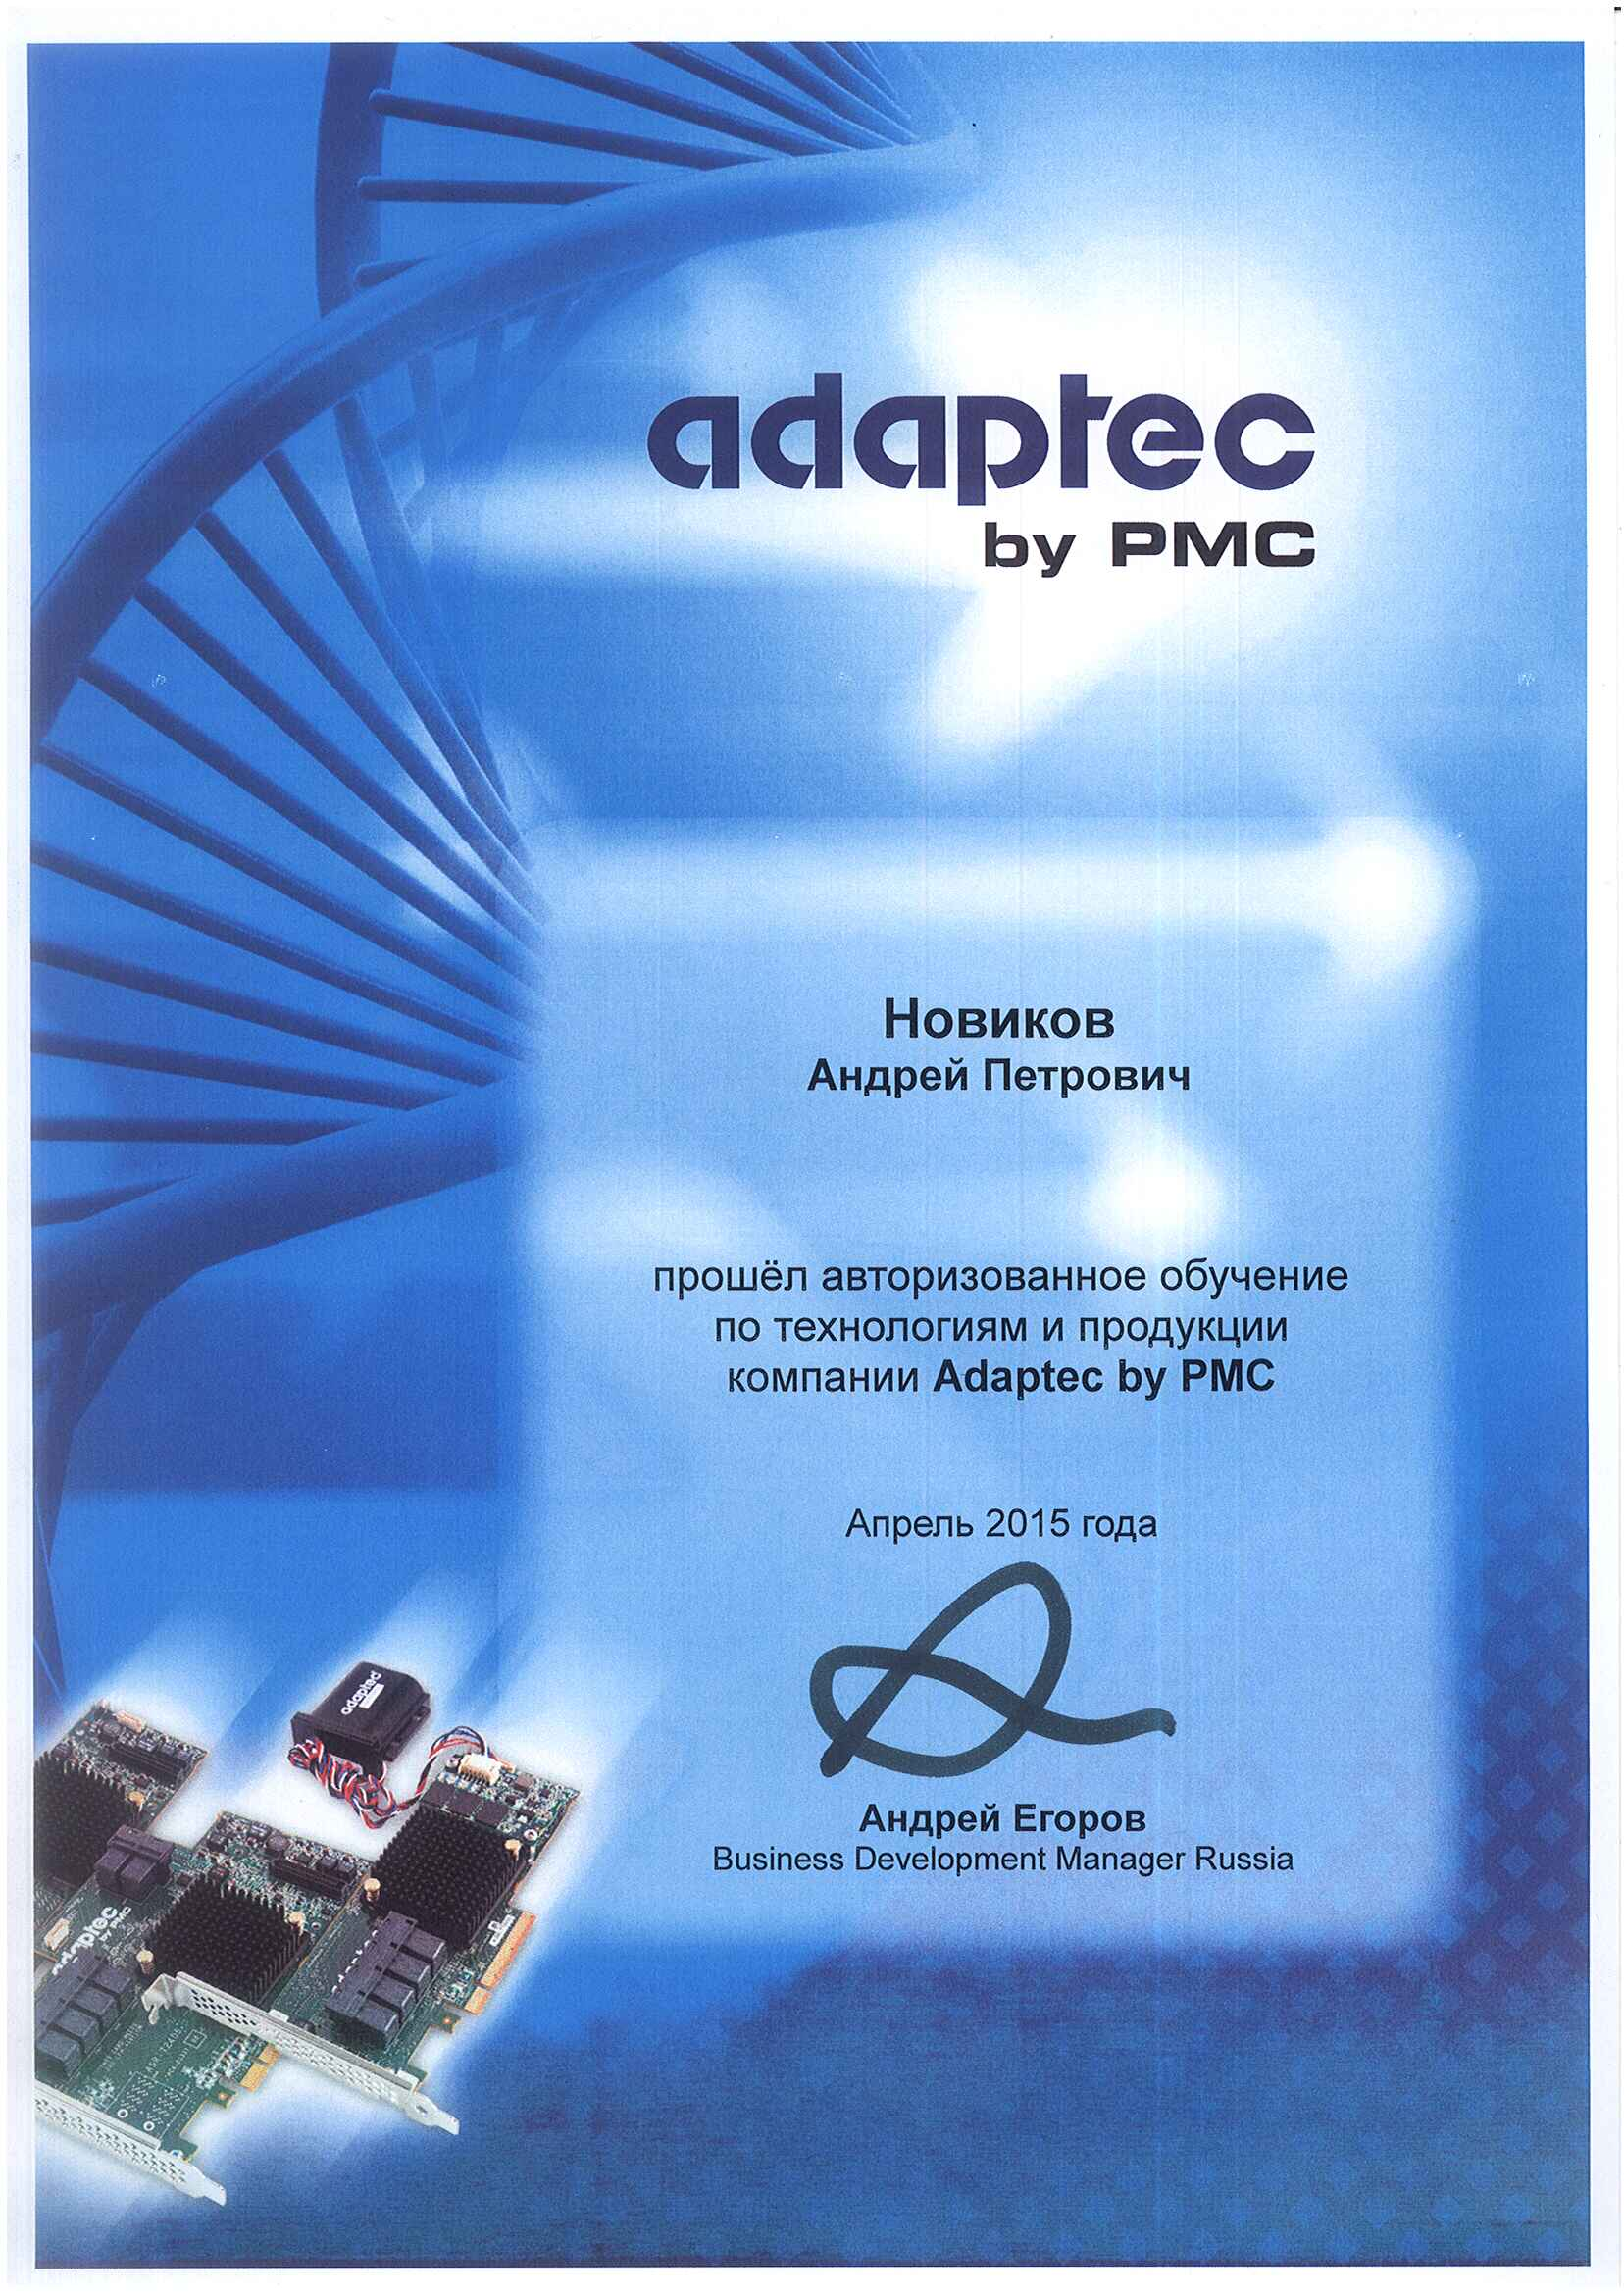 Сертификат Adaptec-Новиков Андрей Петрович